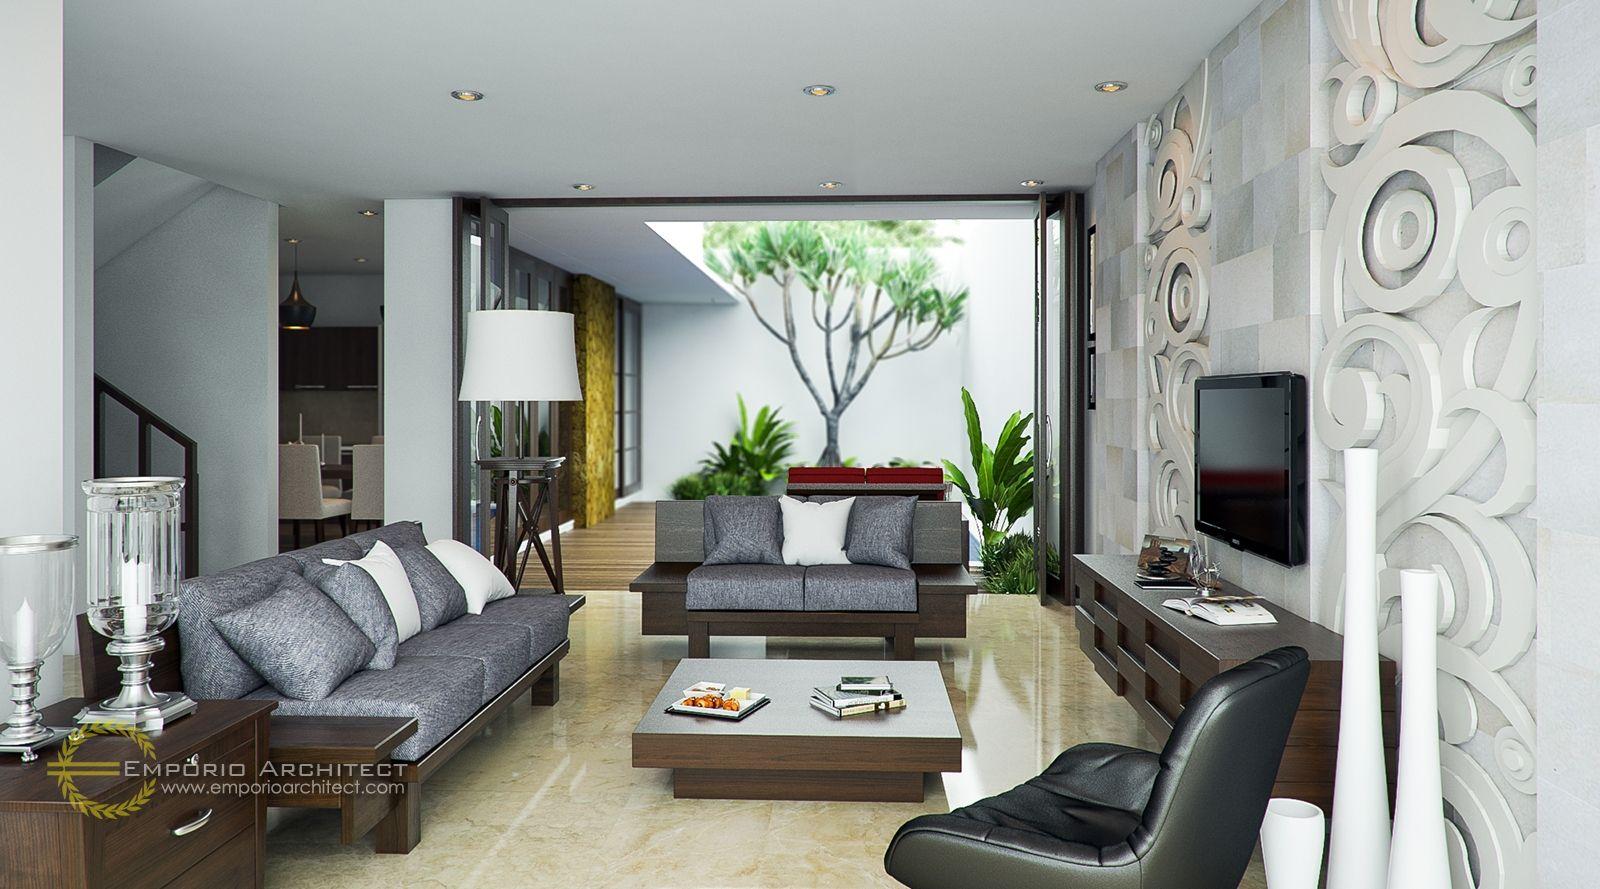 Jasa Desain Interior - Living Room #desaininterior #desaininteriorrumah #jasainterior #jasadesaininterior #interiorrumah #jasainteriorrumah #interiorrumahminimalis #interiorrumahmodern